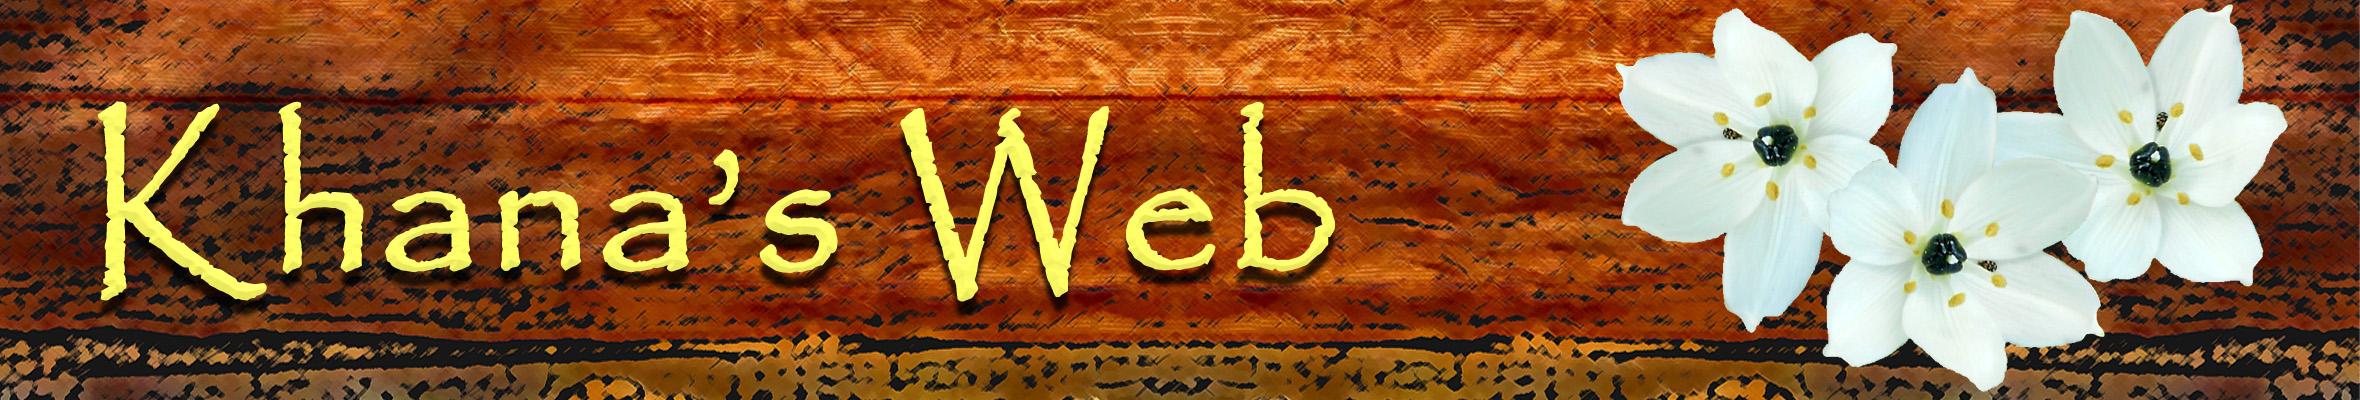 Khana's Web @ Zazzle